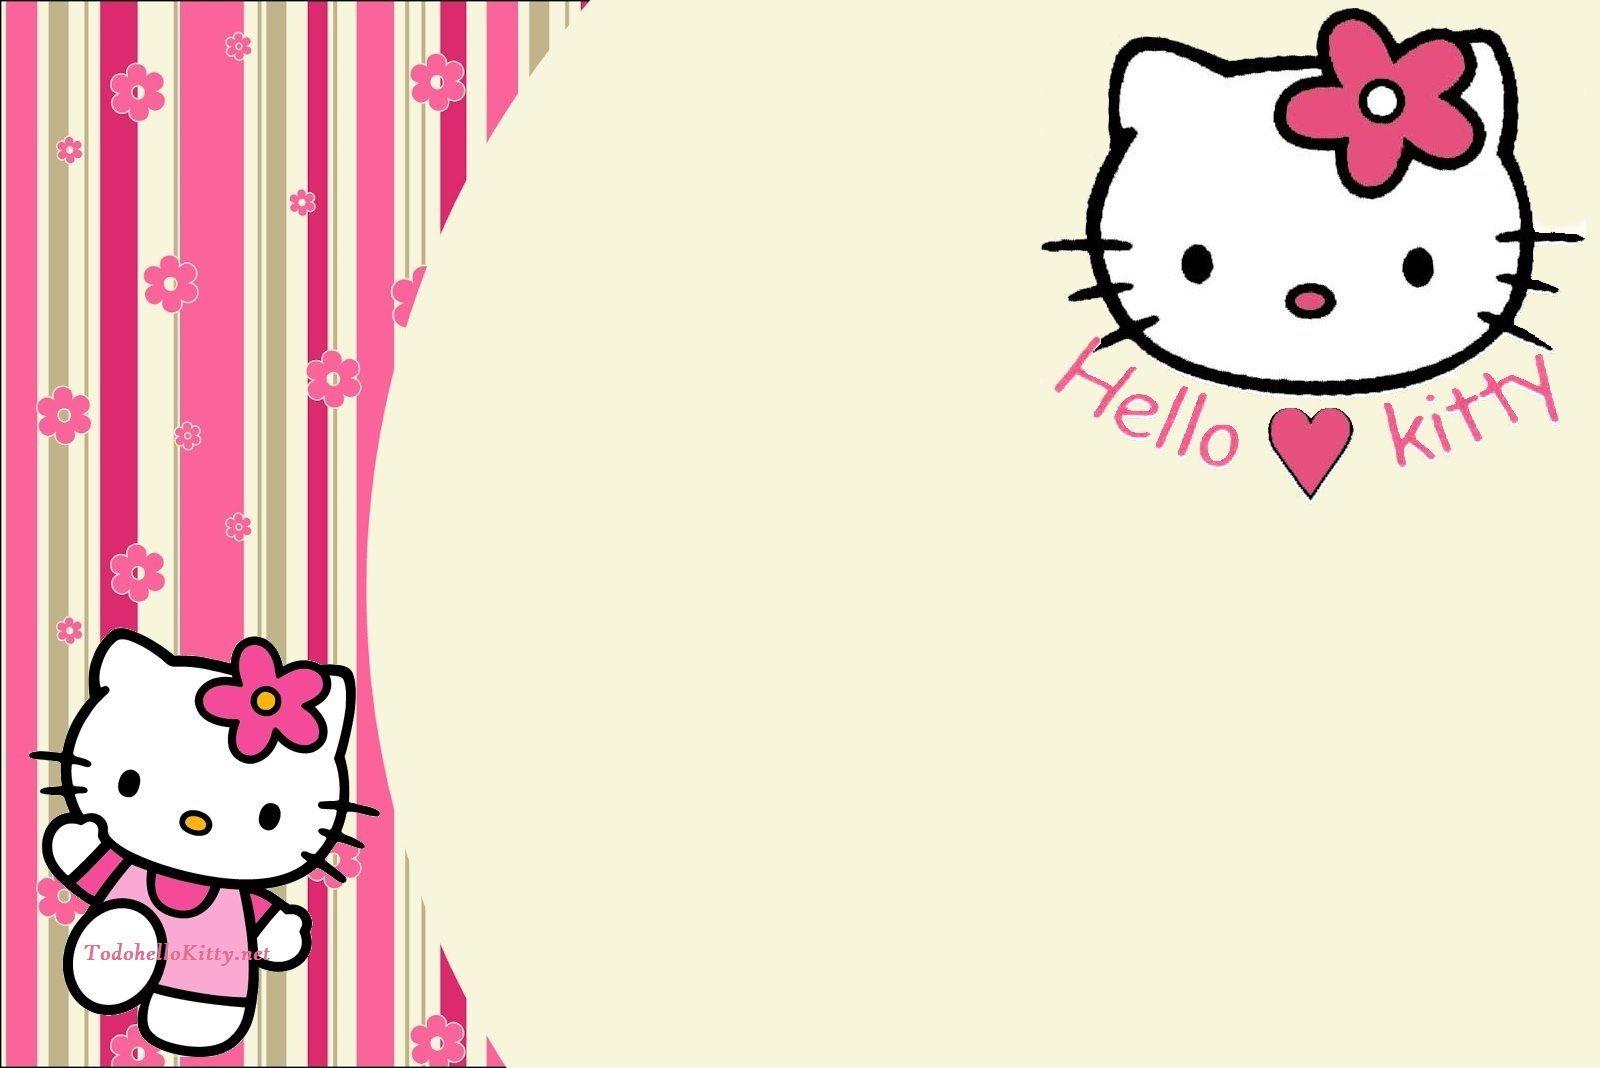 Pin De Marnny Benitez En Hello Kitty Pinterest Hello Kitty